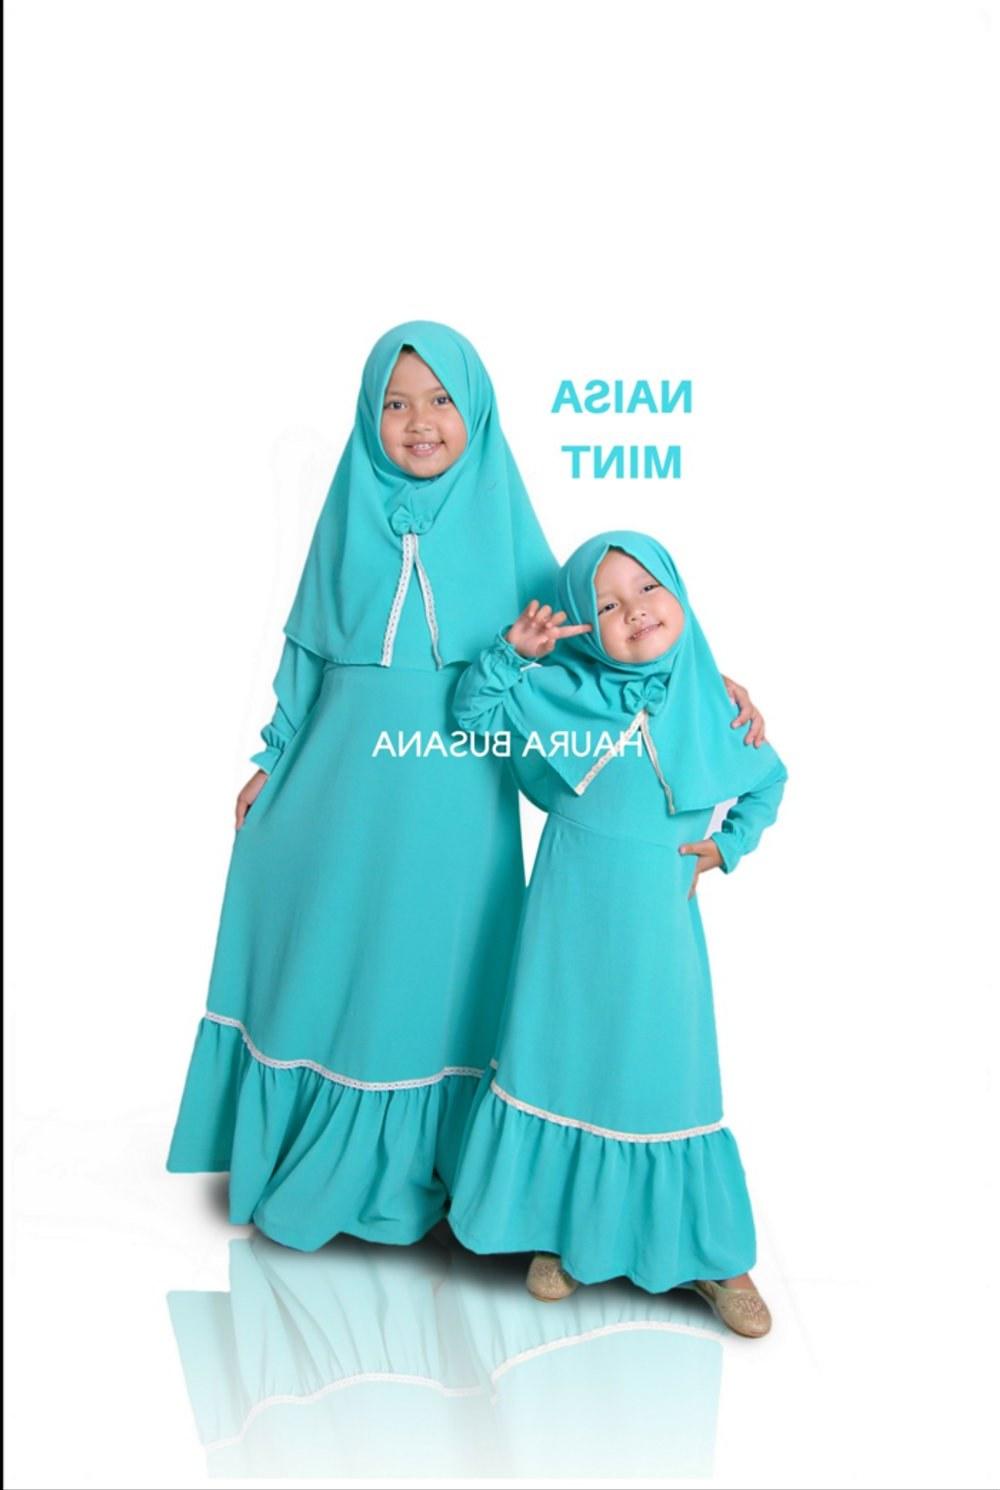 Bentuk Gaun Pengantin Muslimah Terbaru D0dg Bayi